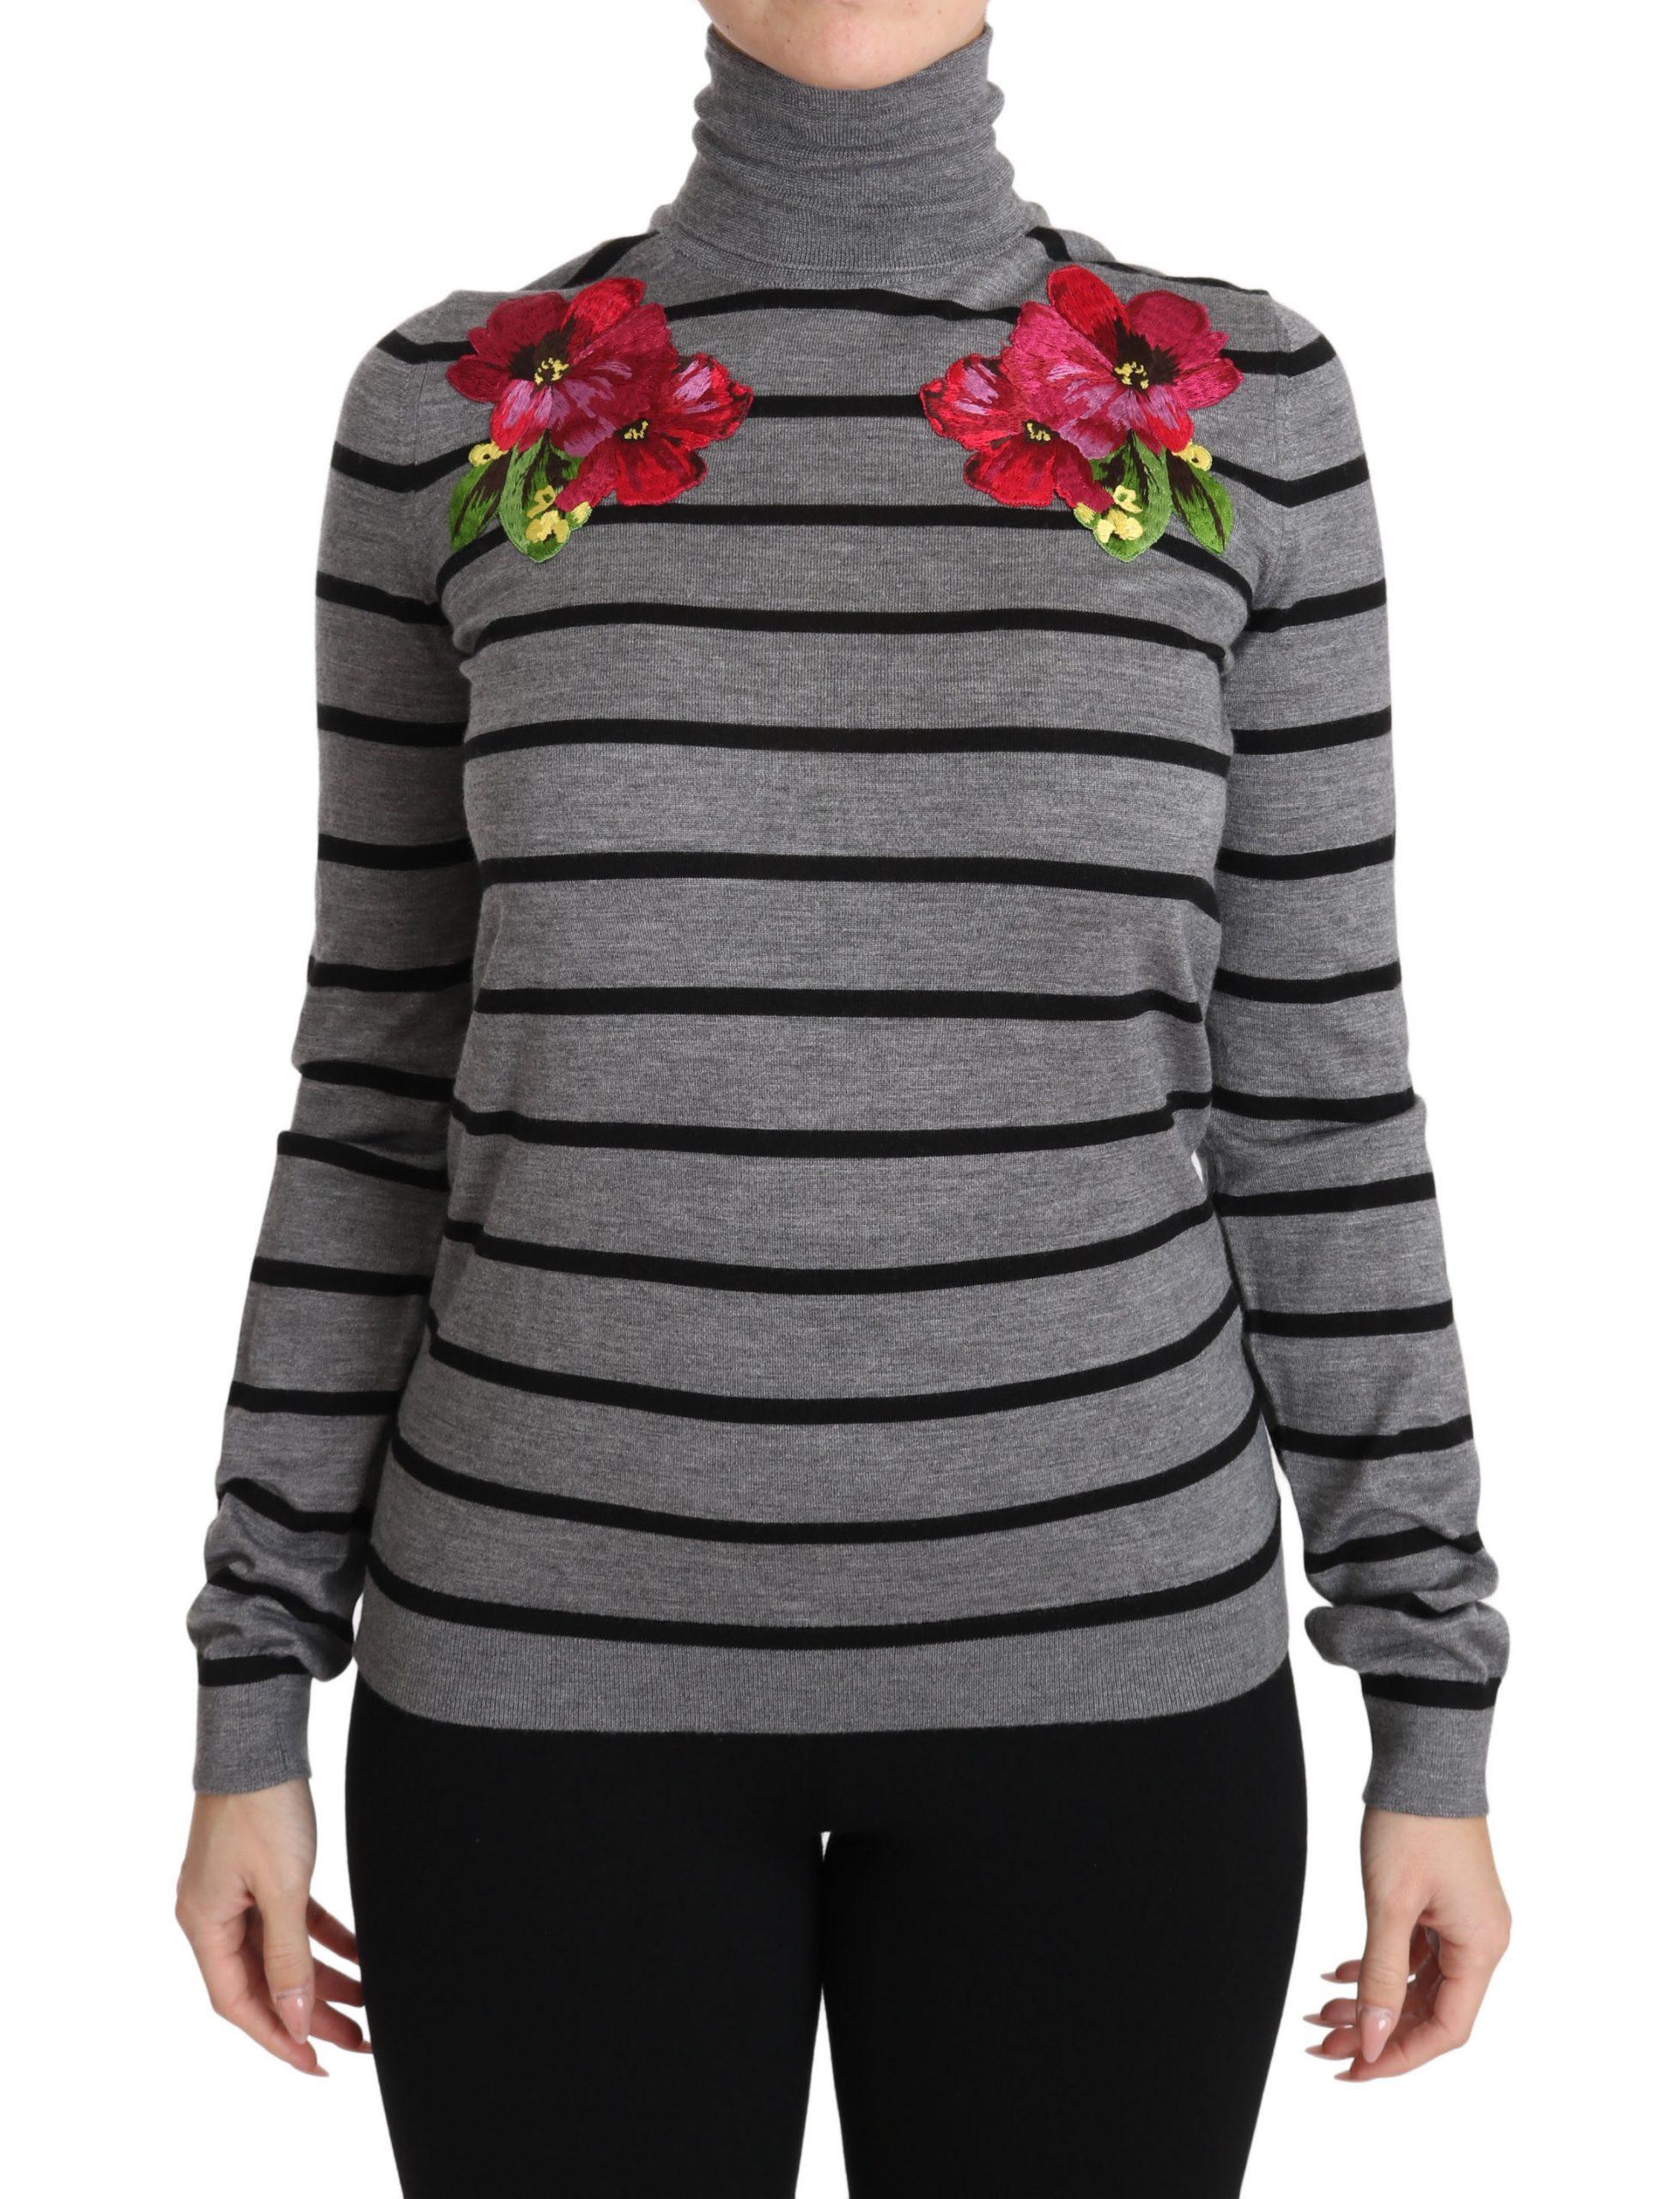 Dolce & Gabbana Women's Cashmere Silk Turtleneck Sweater Black TSH2985 - IT38|XS